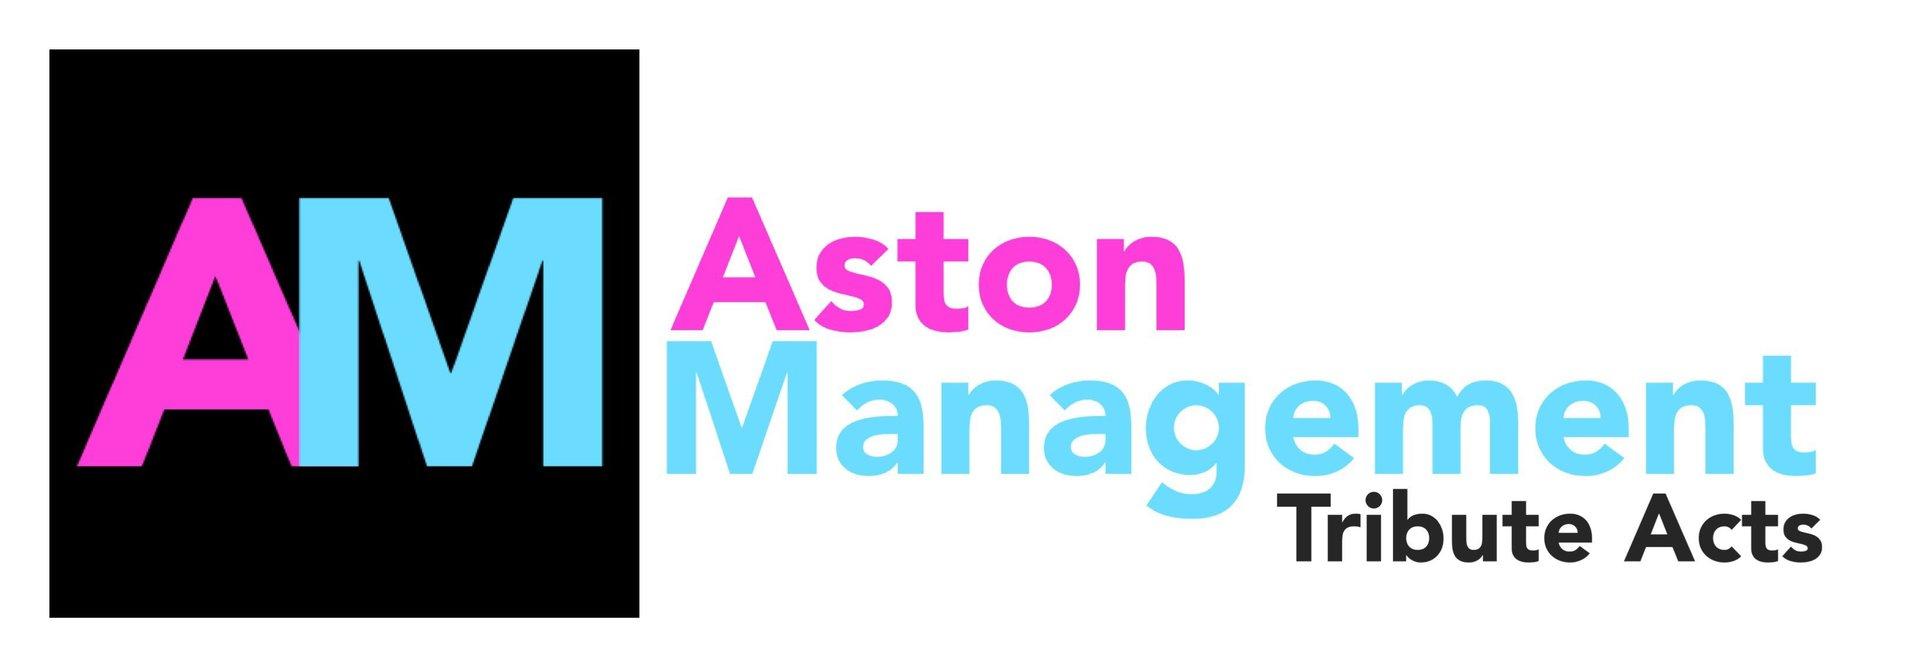 Aston Management logo